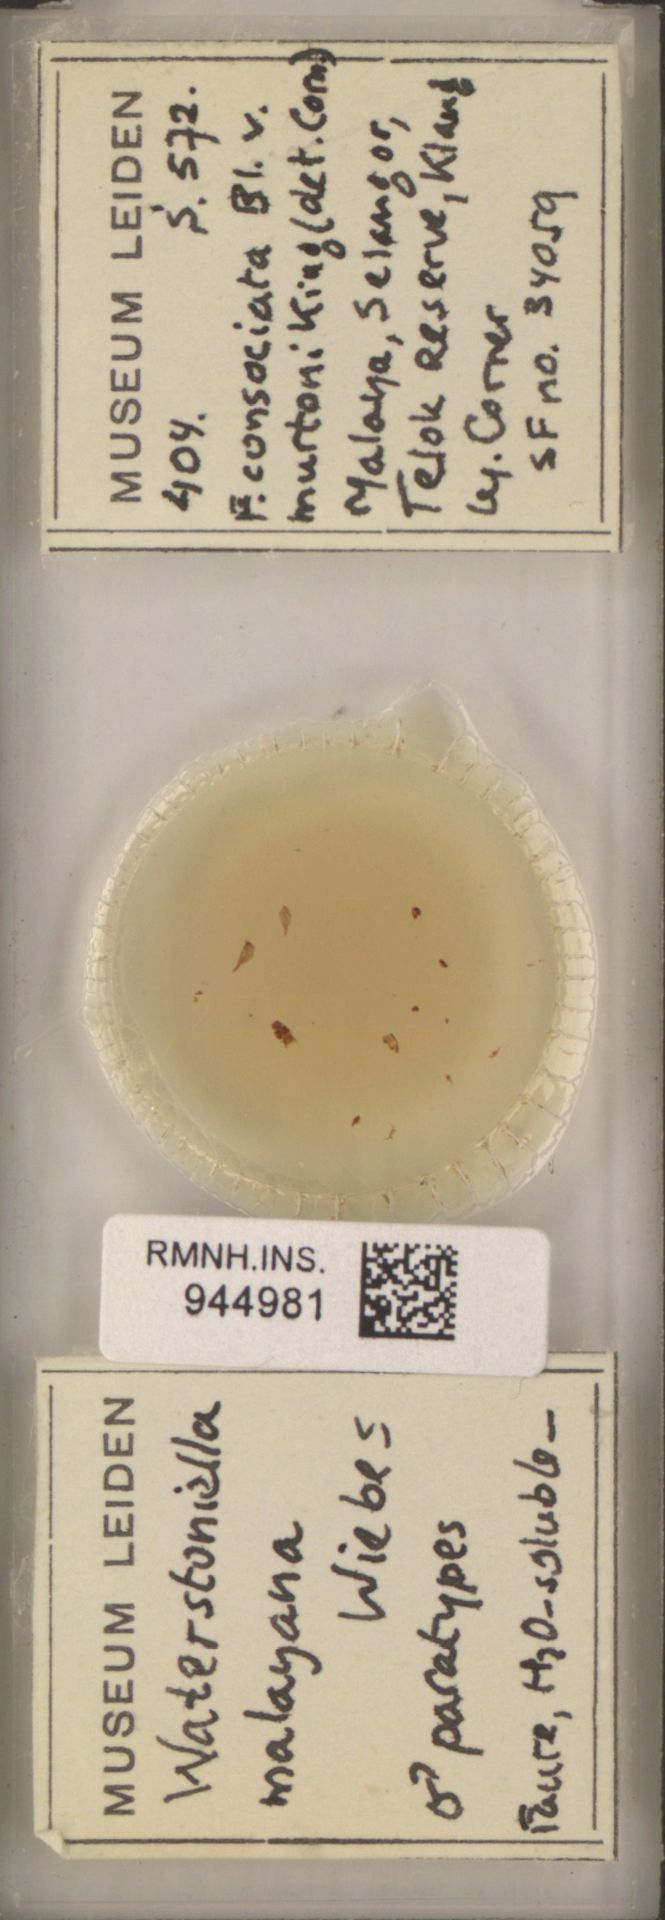 RMNH.INS.944981 | Waterstoniella malayana Wiebes